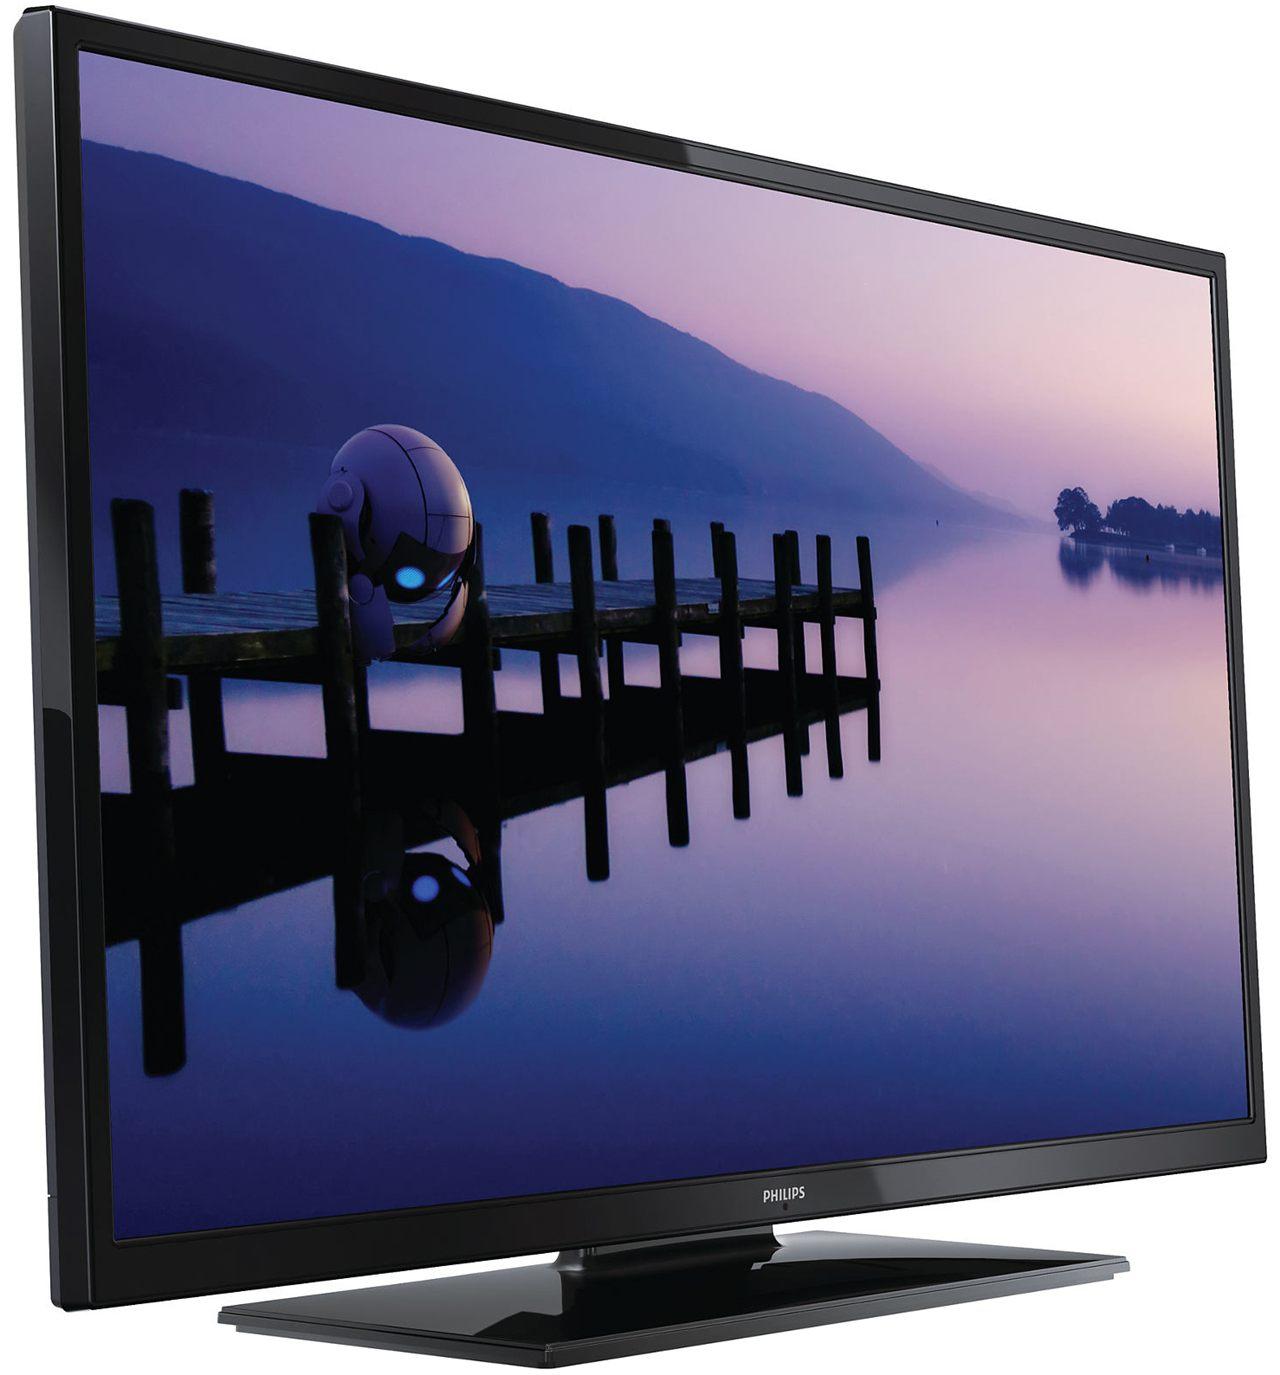 Televizor LED Philips 40PFL3008, 102 cm, Full HD - profil